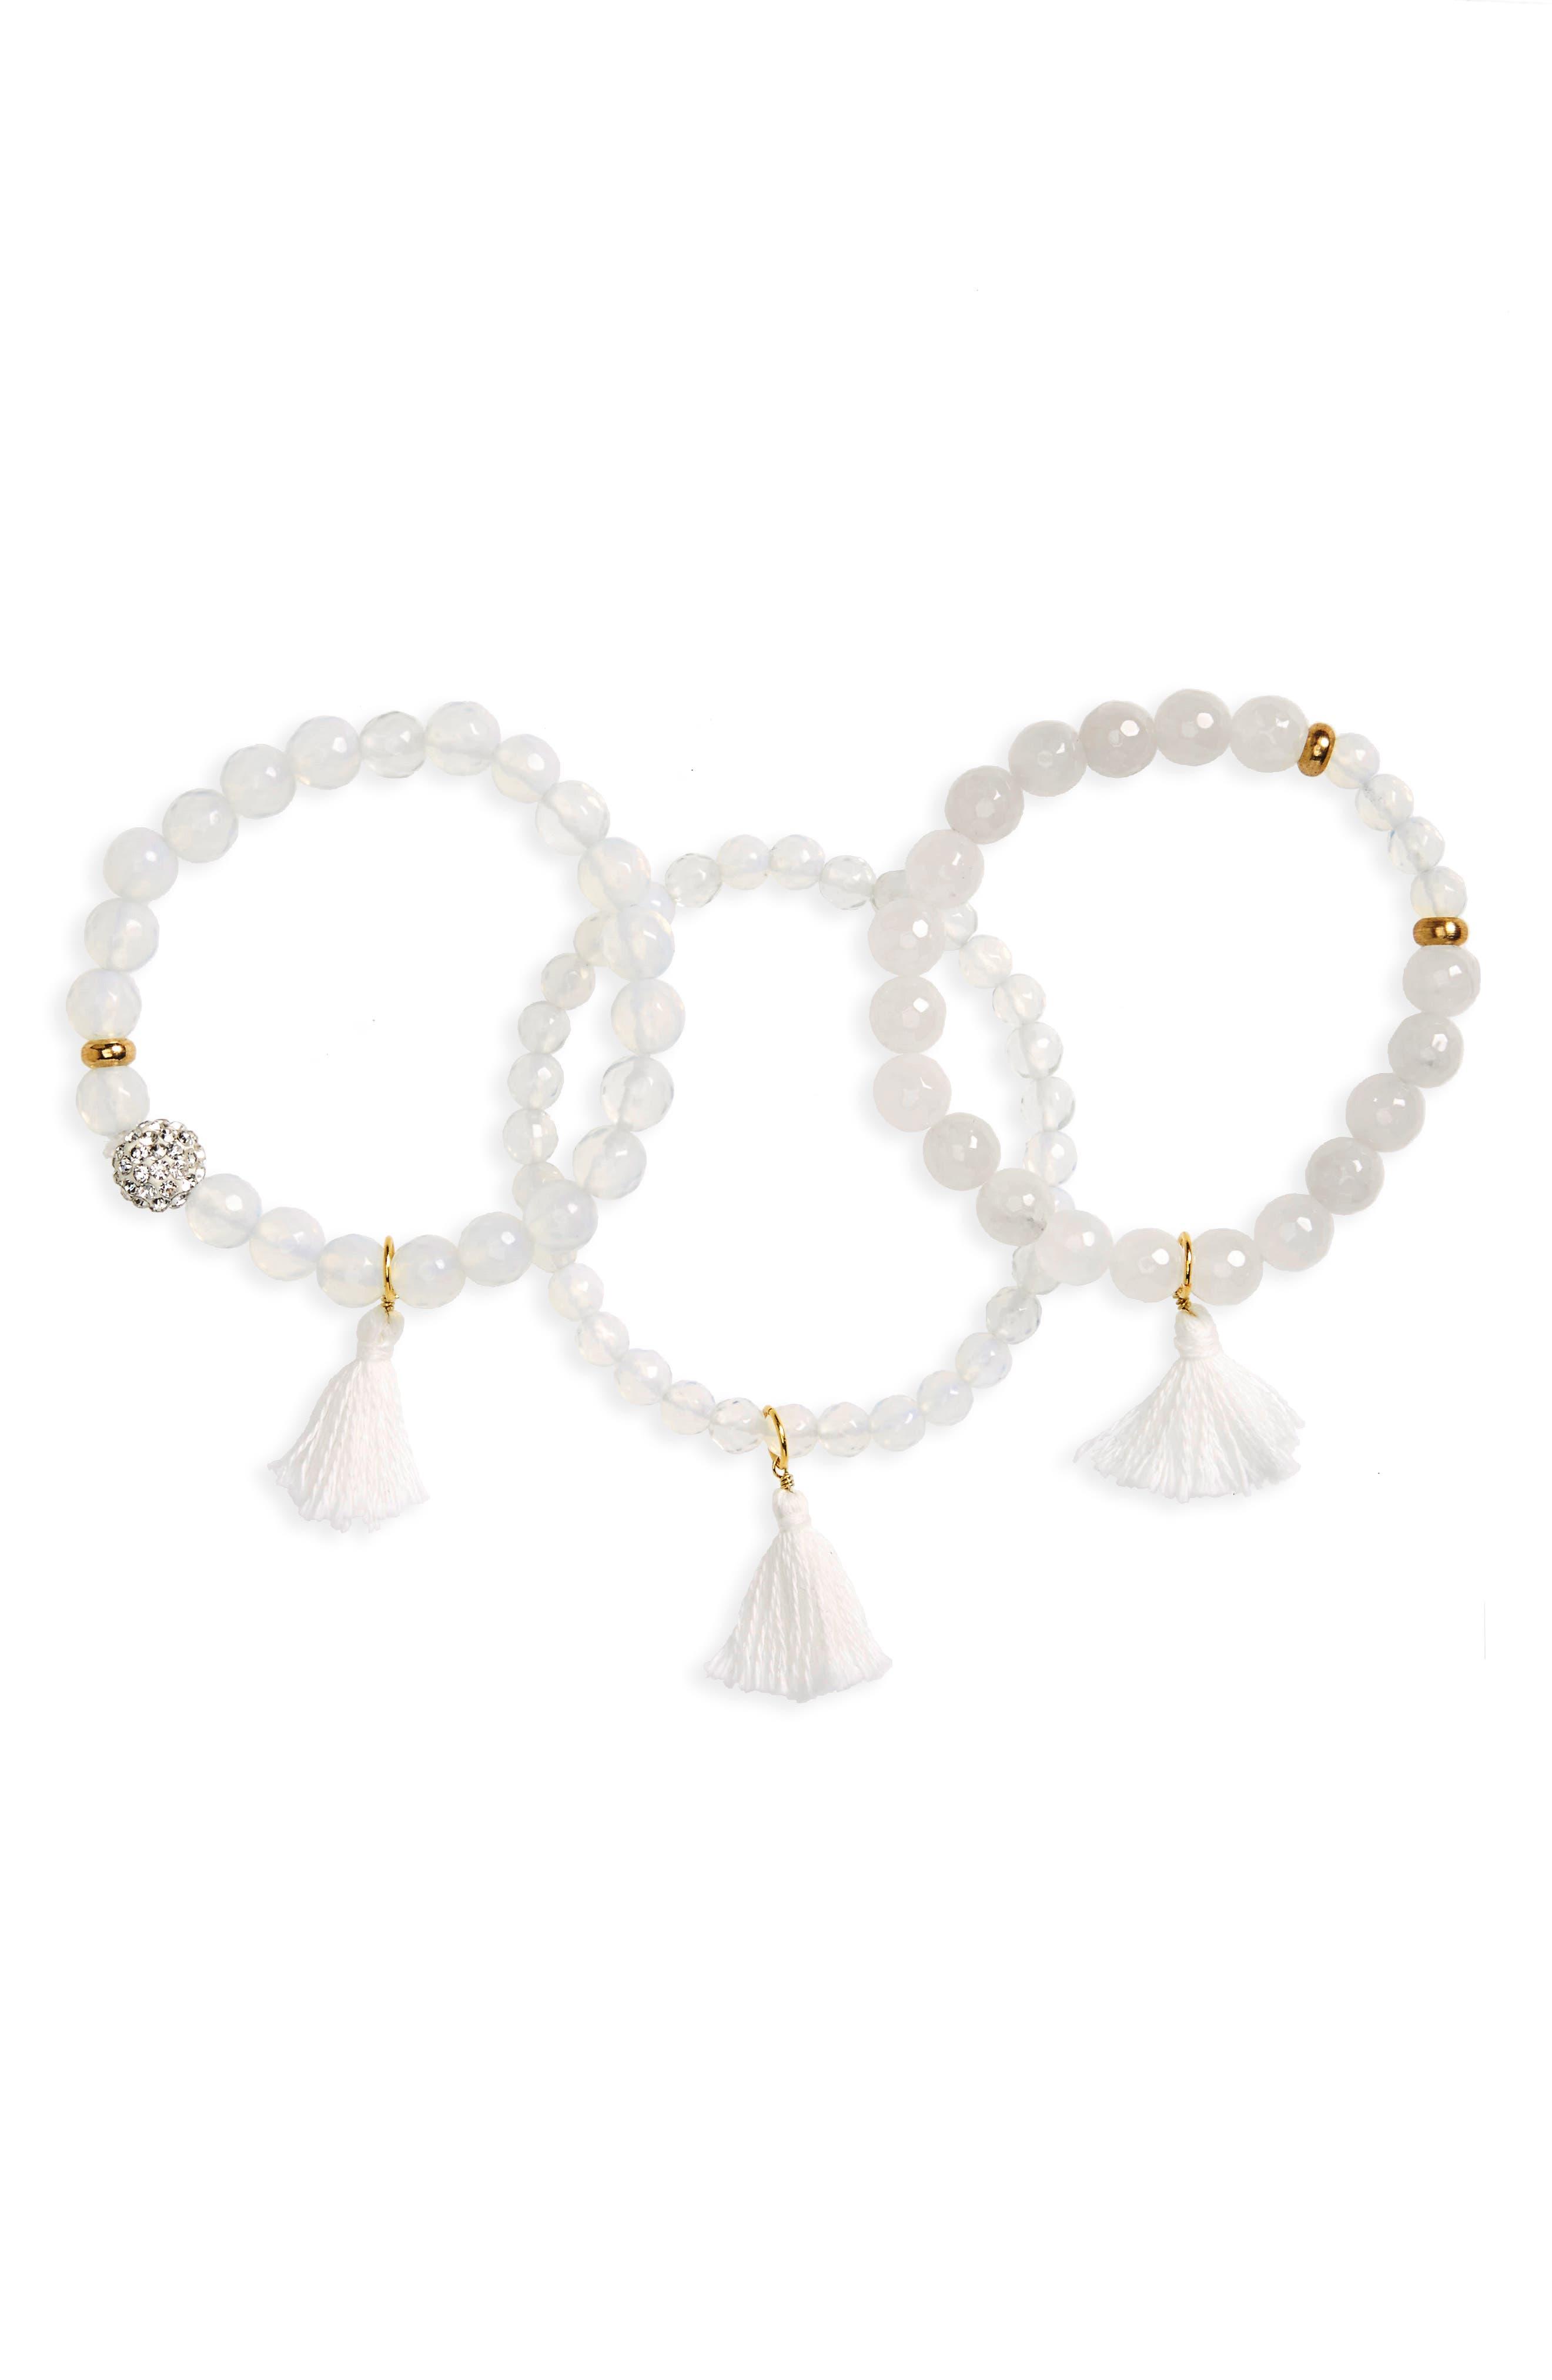 Alternate Image 1 Selected - Panacea Set of 3 Beaded Stretch Bracelets